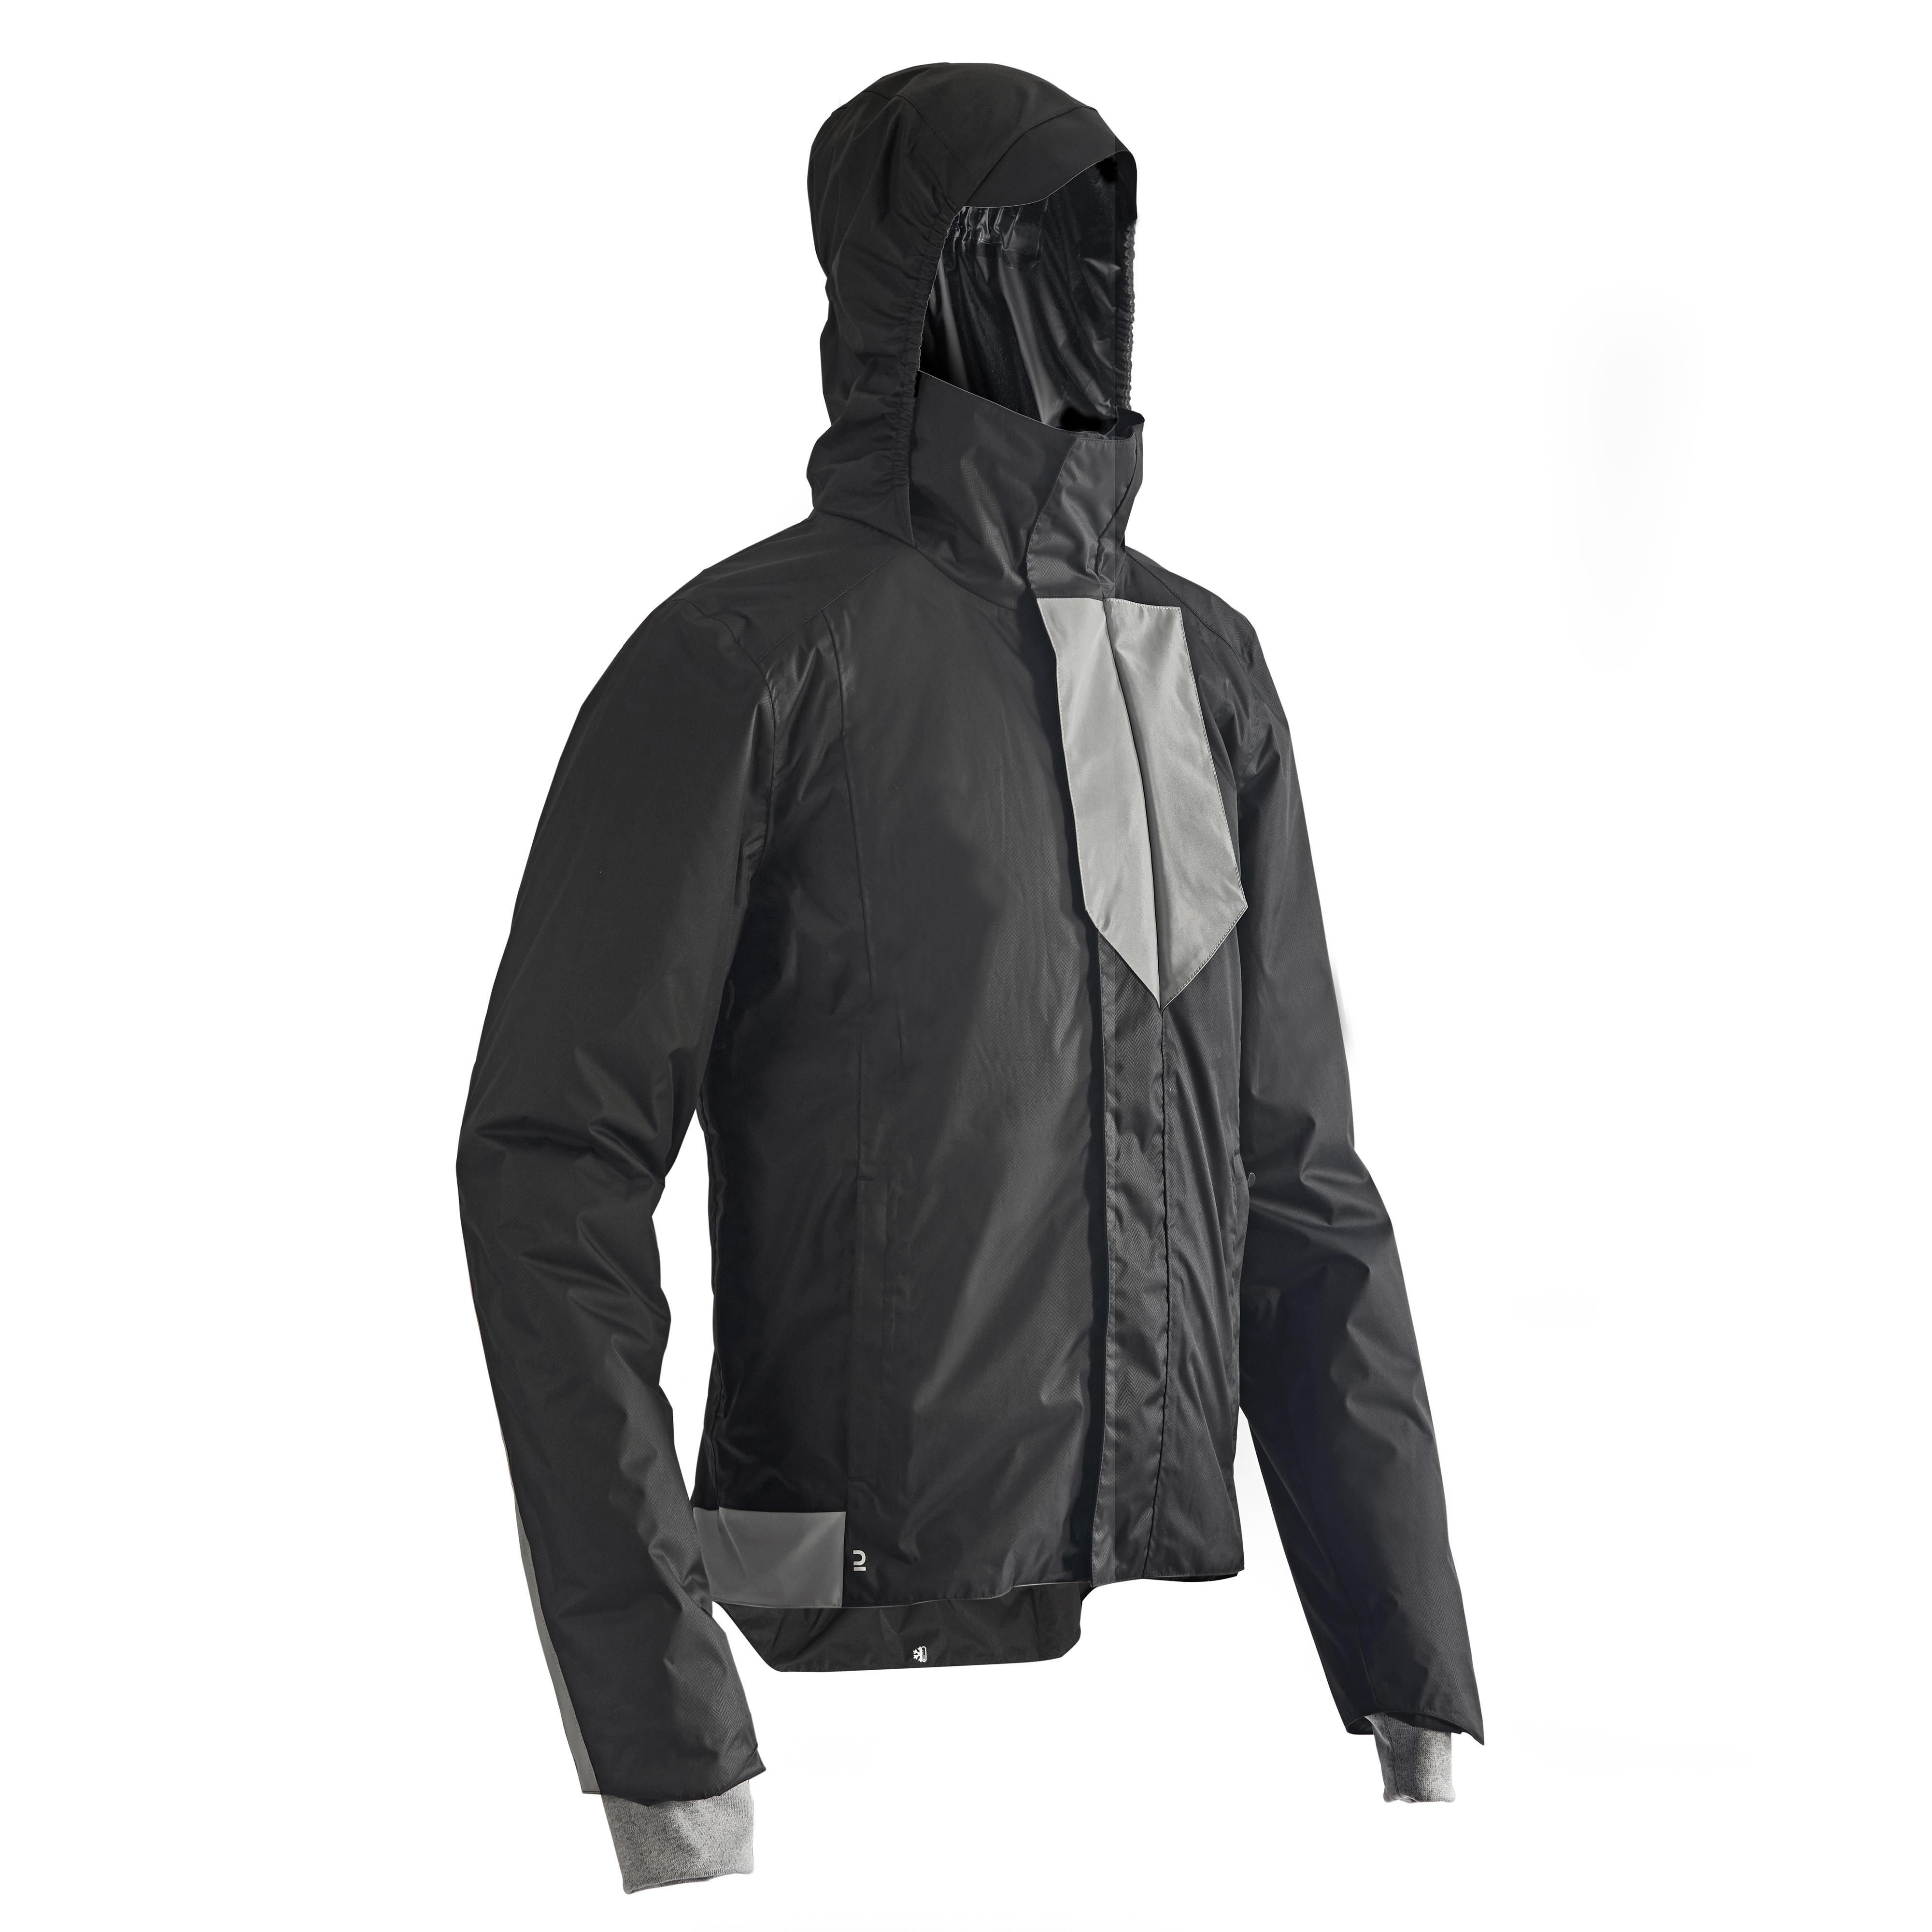 Jachetă ciclism ploaie 500 la Reducere poza